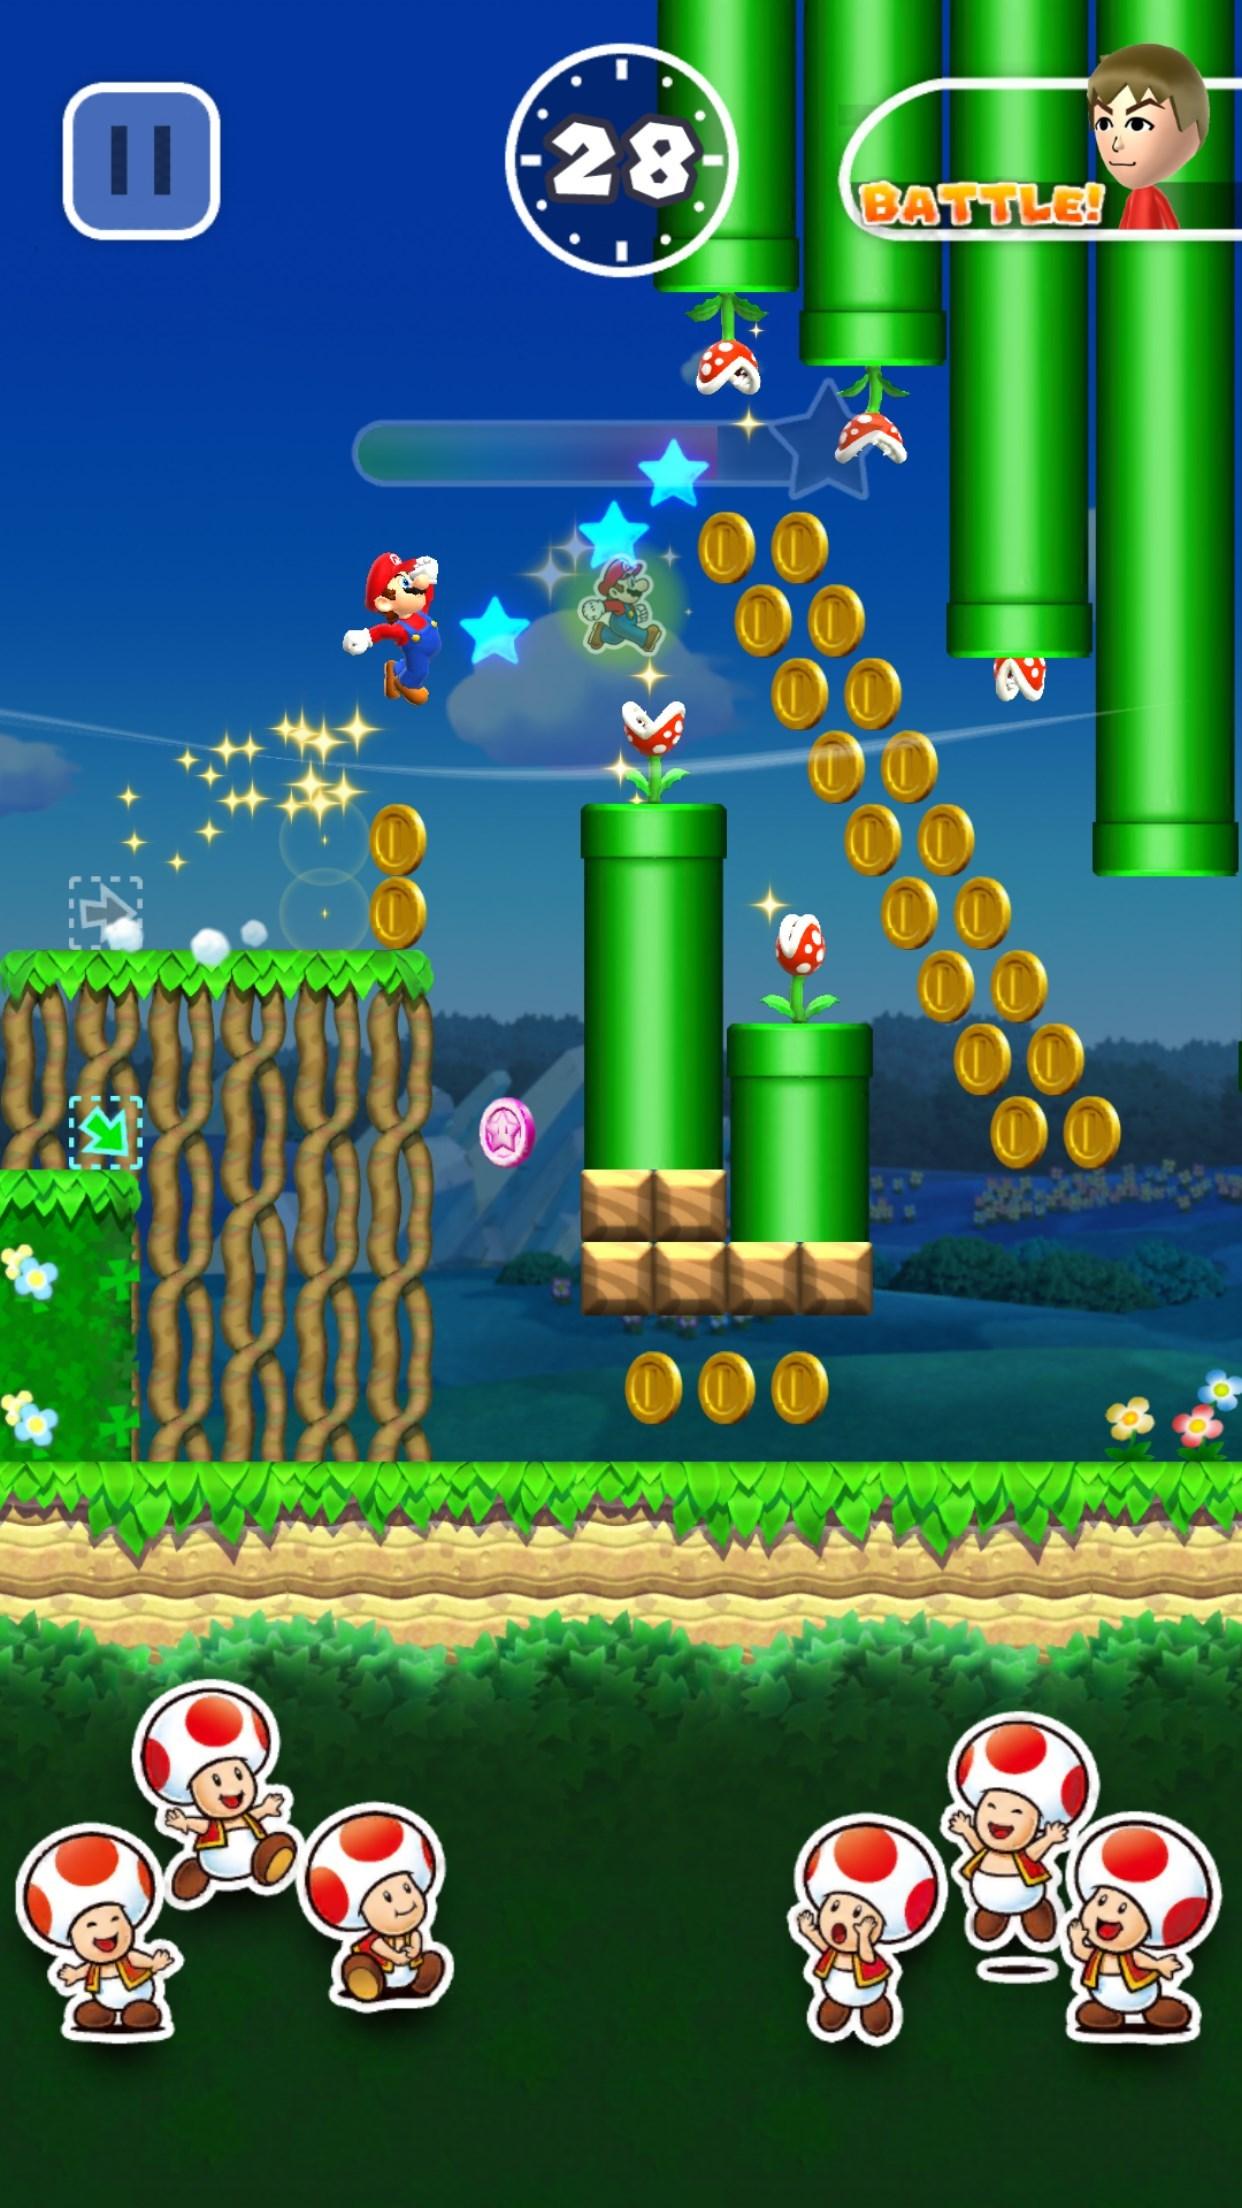 Urge to play Super Mario Run rising...